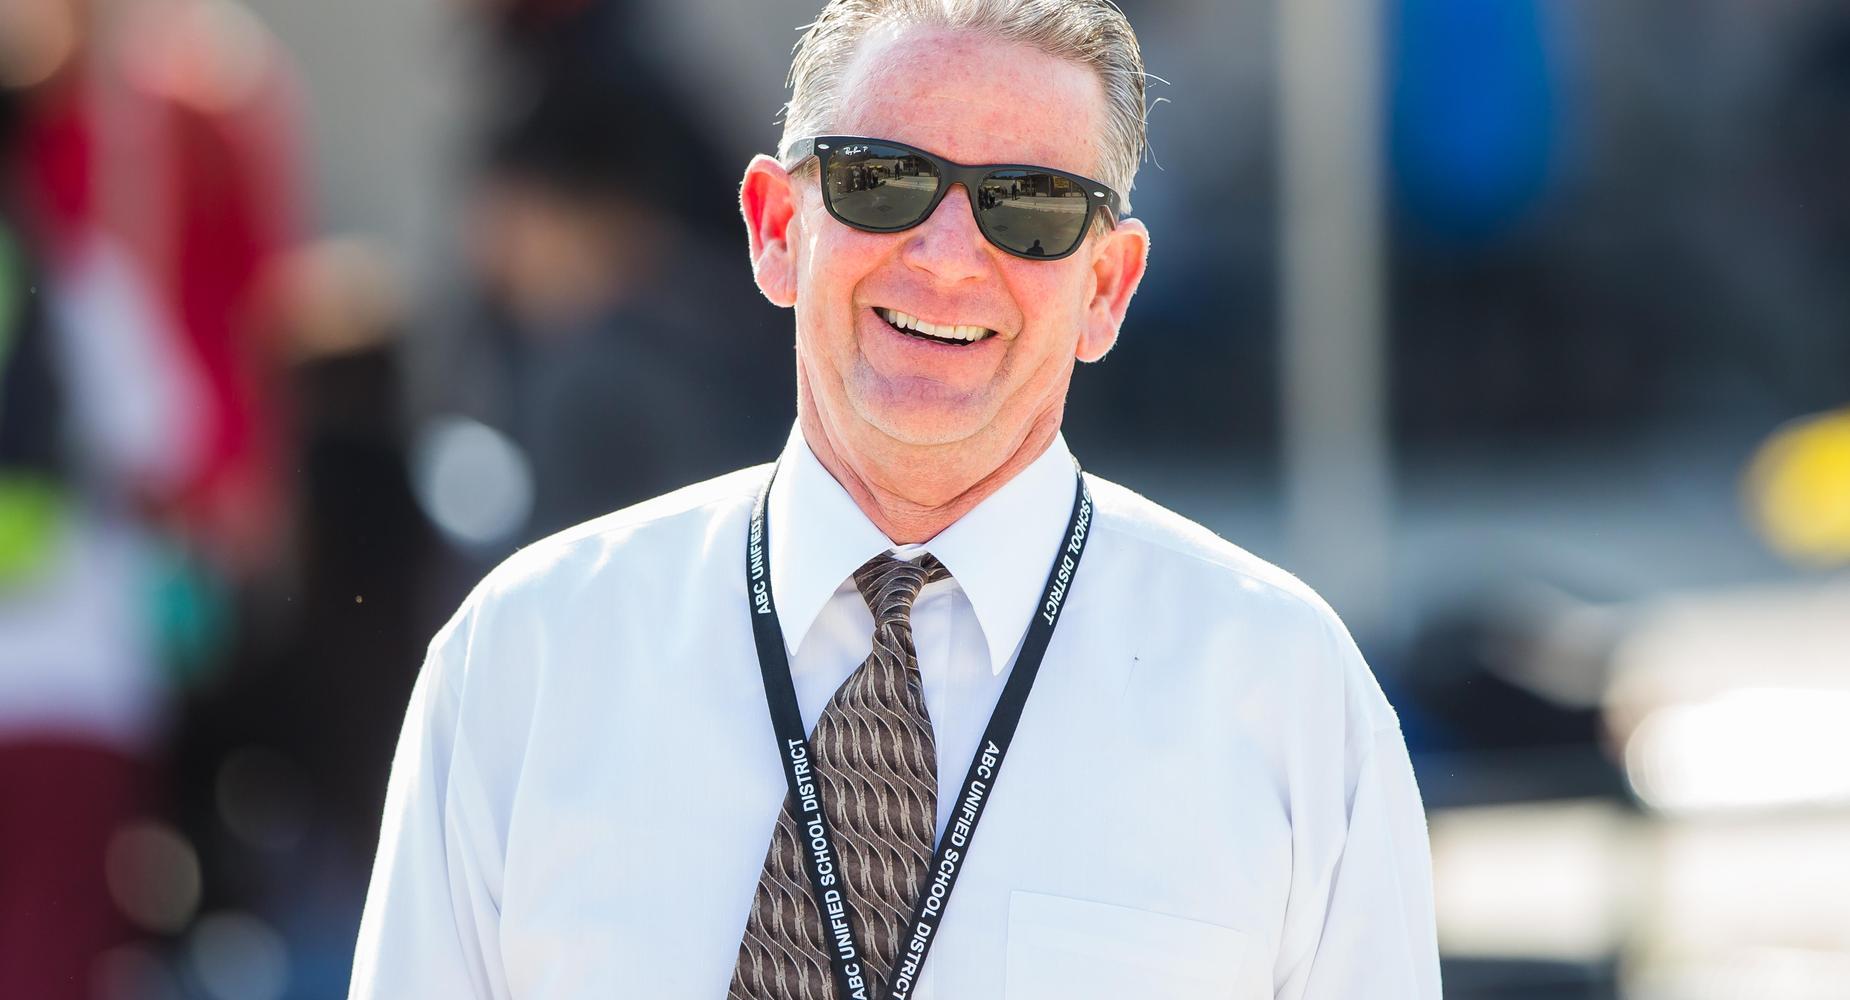 Mr. Walker, principal